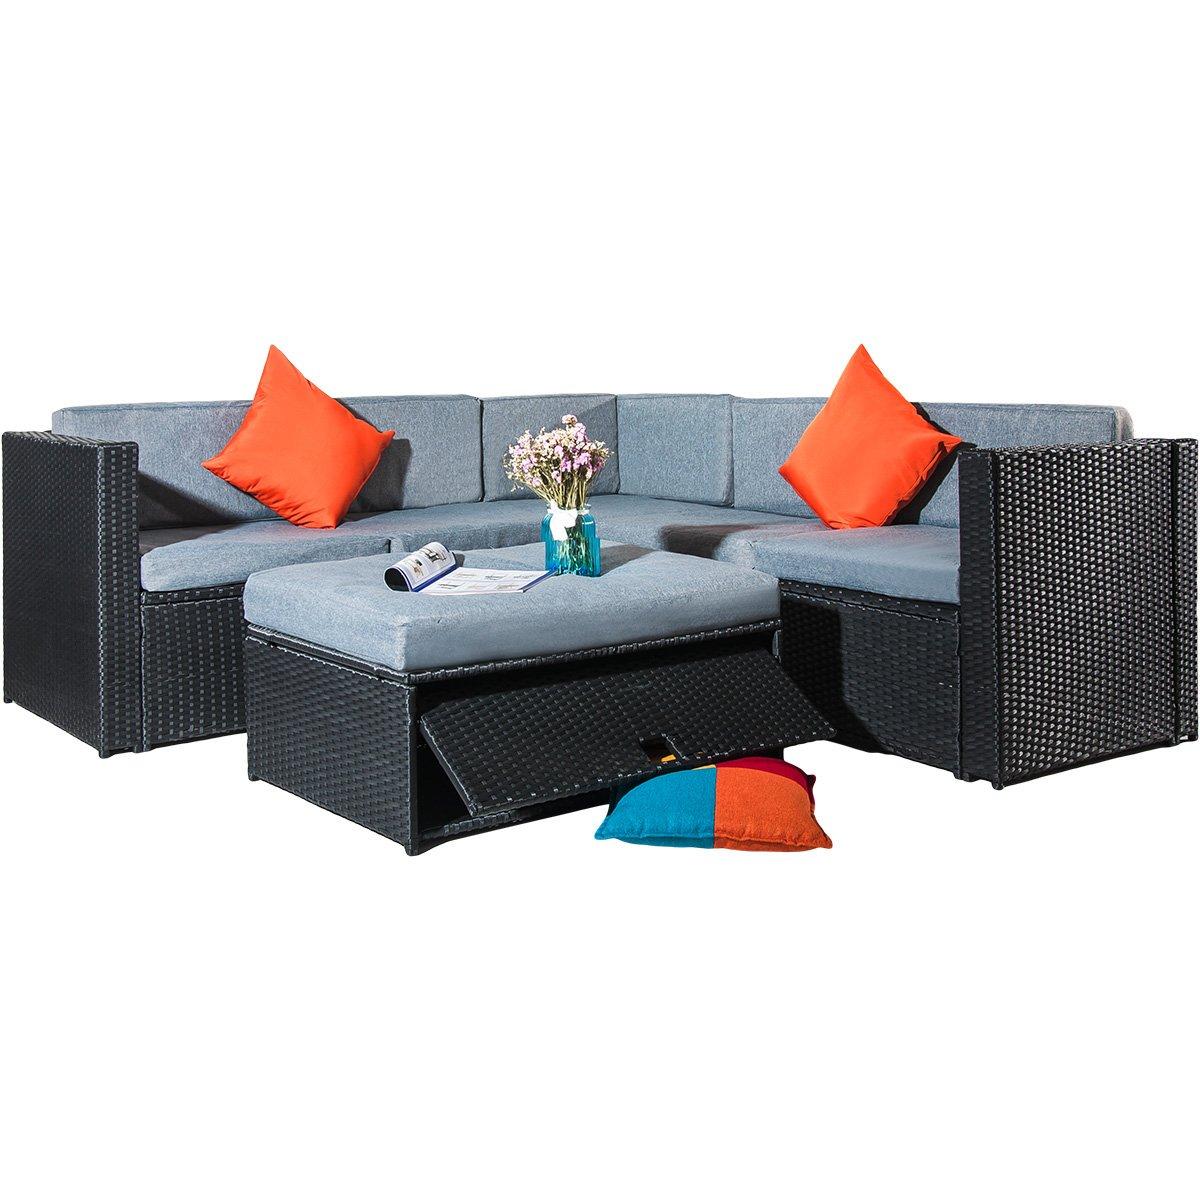 Tenozek 4 Piece Cushioned Outdoor Patio PE Rattan Furniture Set Sectional Garden Sofa